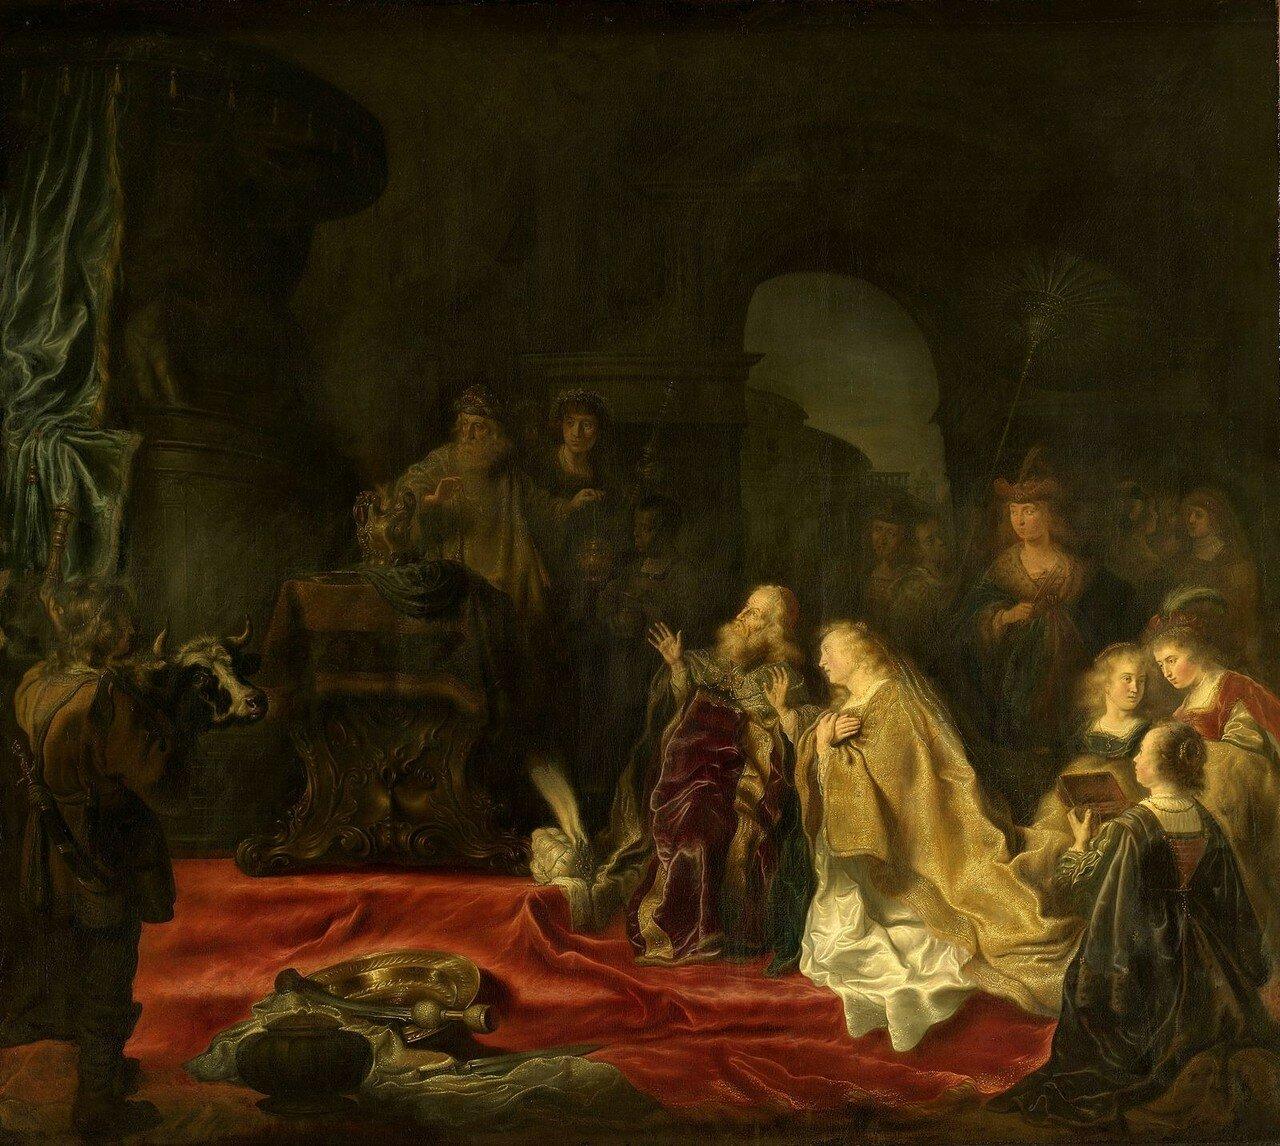 1644_Идолопоклонство царя Соломона (The Idolatry of King Solomon)_155 х 171.5_х.,м._Амстердам, Рейксмузеум.jpg